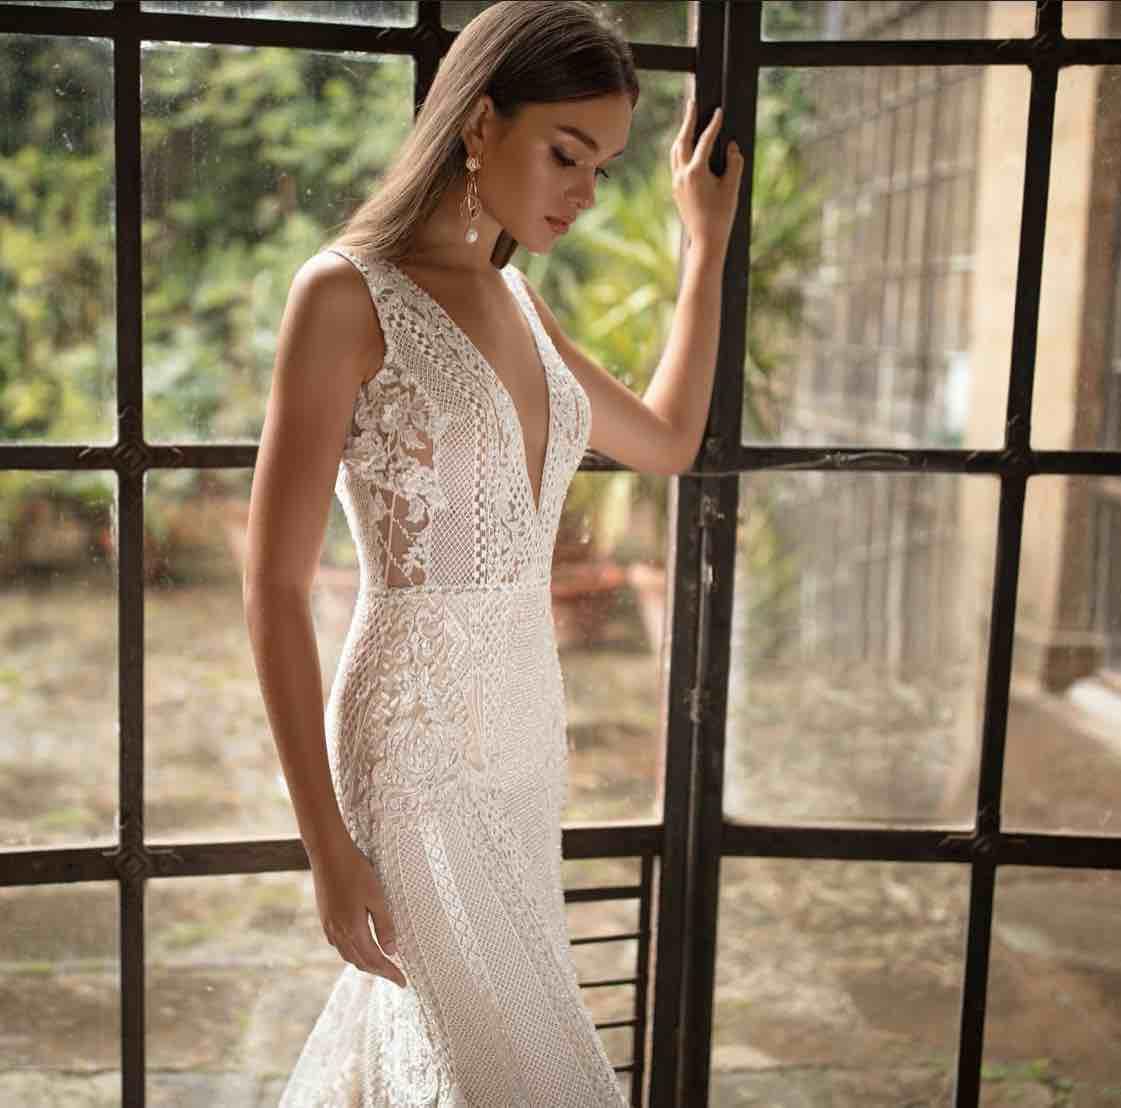 Eva,Helen,Milla Nova, Royal, Blushing Bridal Boutique